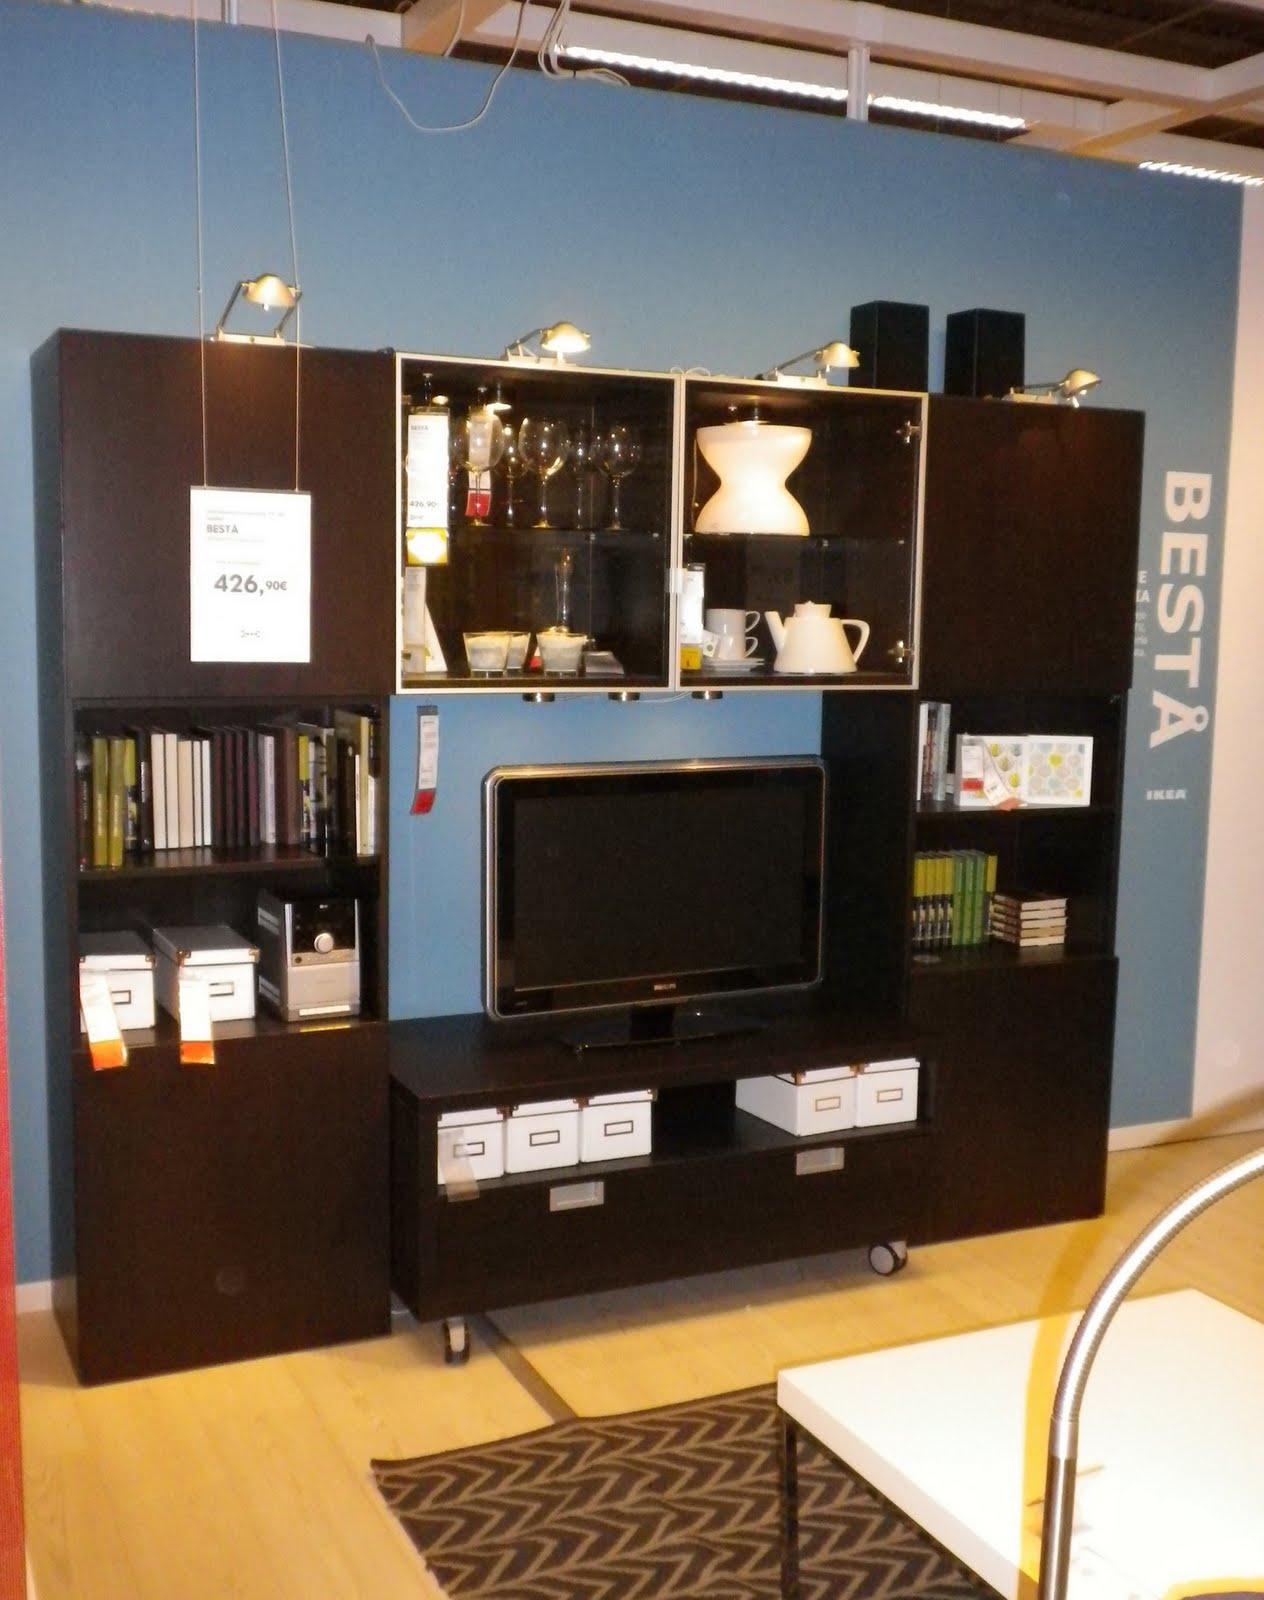 Salones besta de ikea madrid del este iv - Ikea salones besta ...